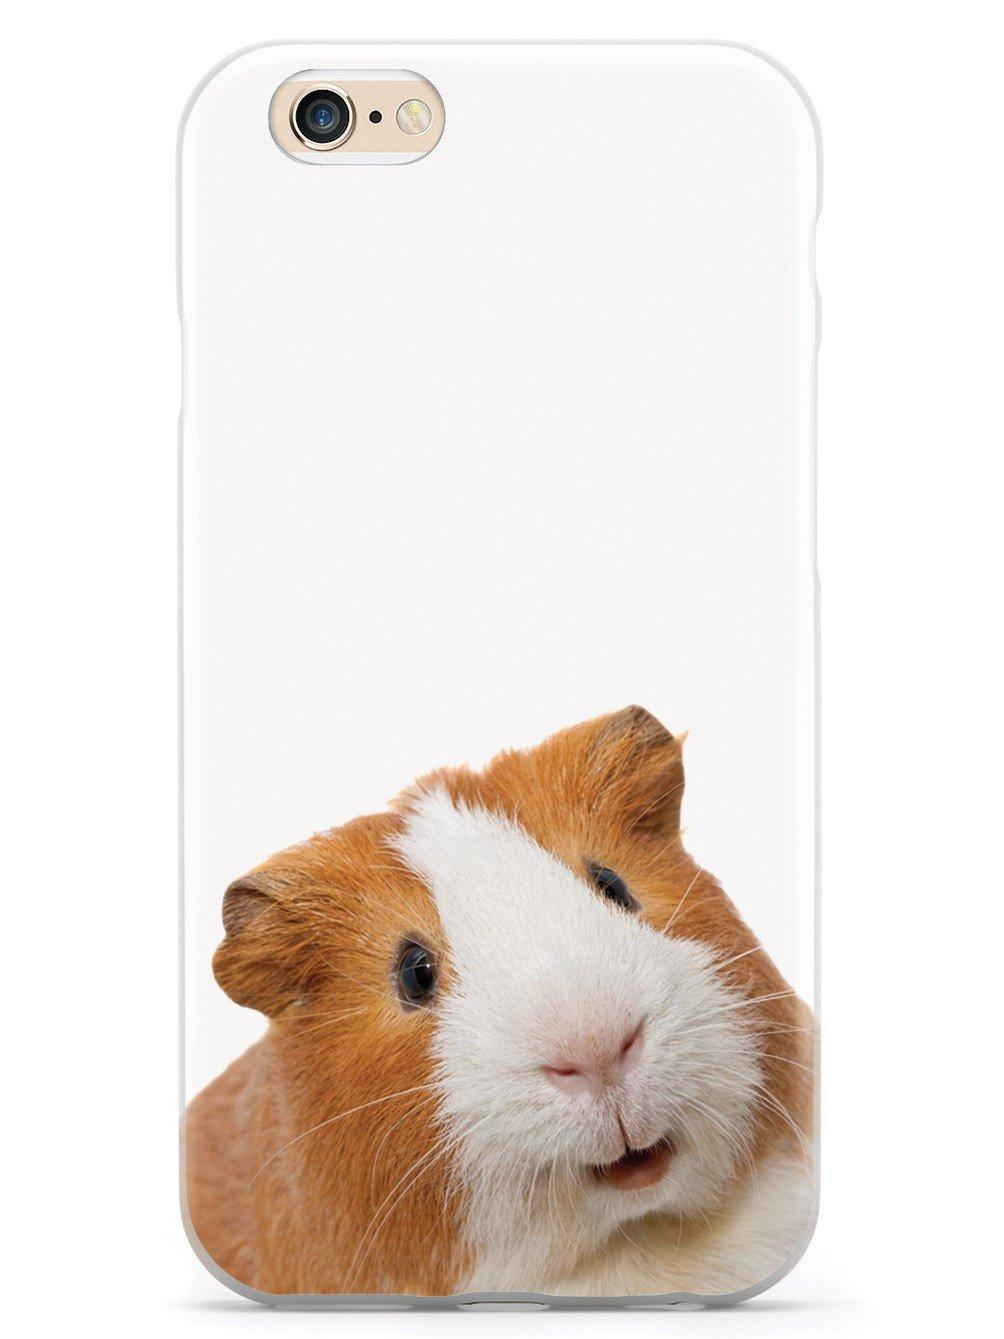 quality design ae6d4 c9842 Inspired Cases Adorable Peeking Guinea Pig Case for iPhone 6 Plus ...